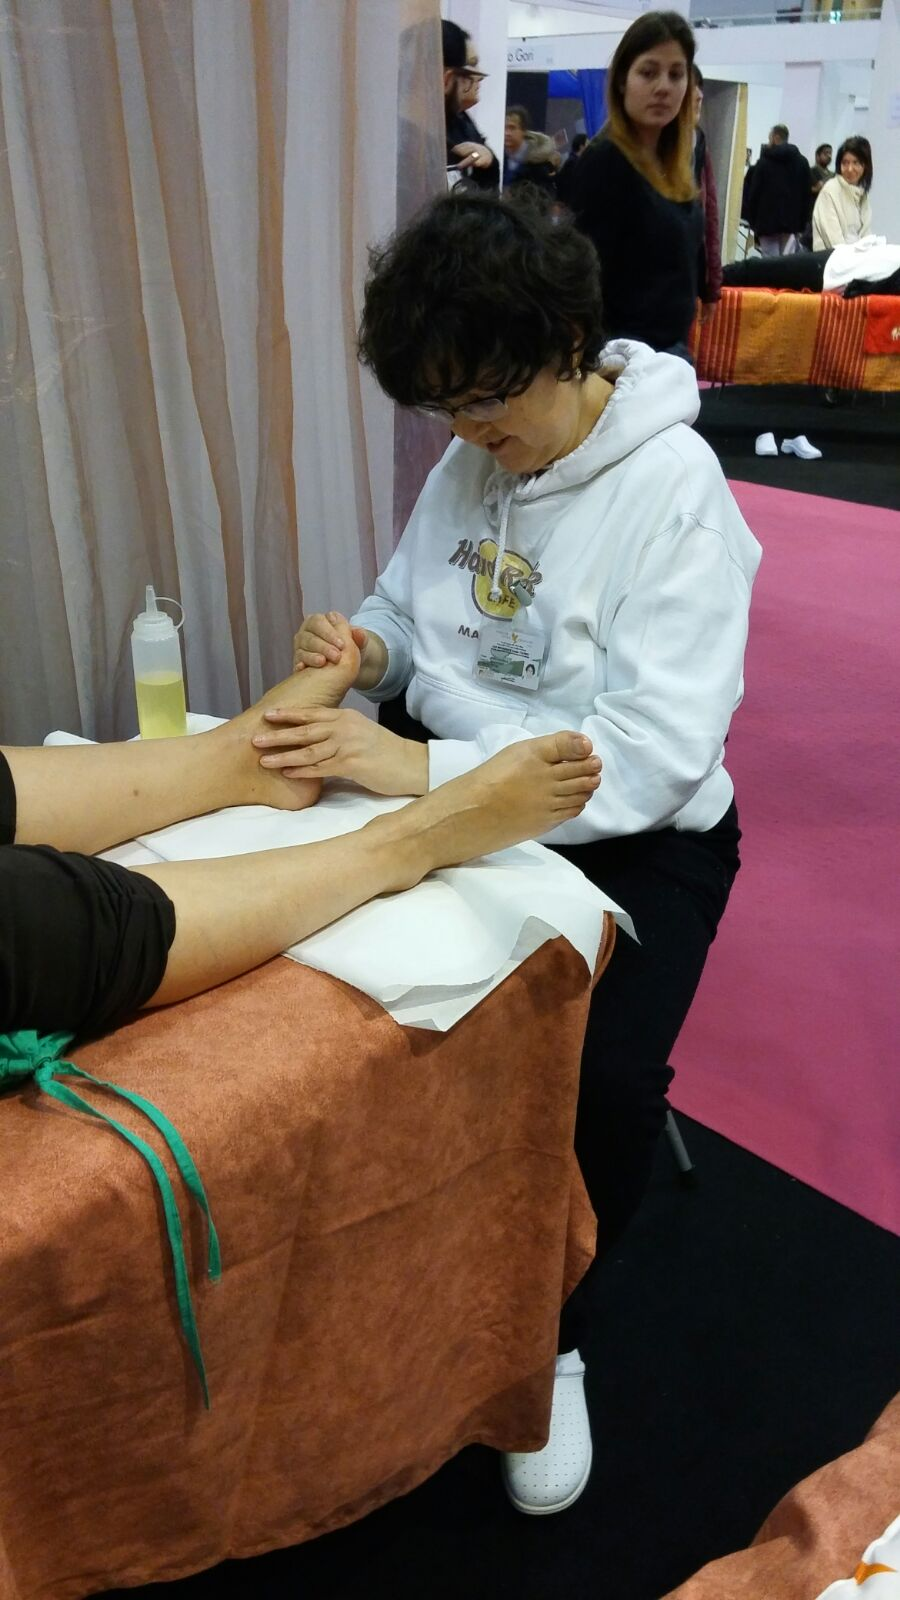 Massagio del piede